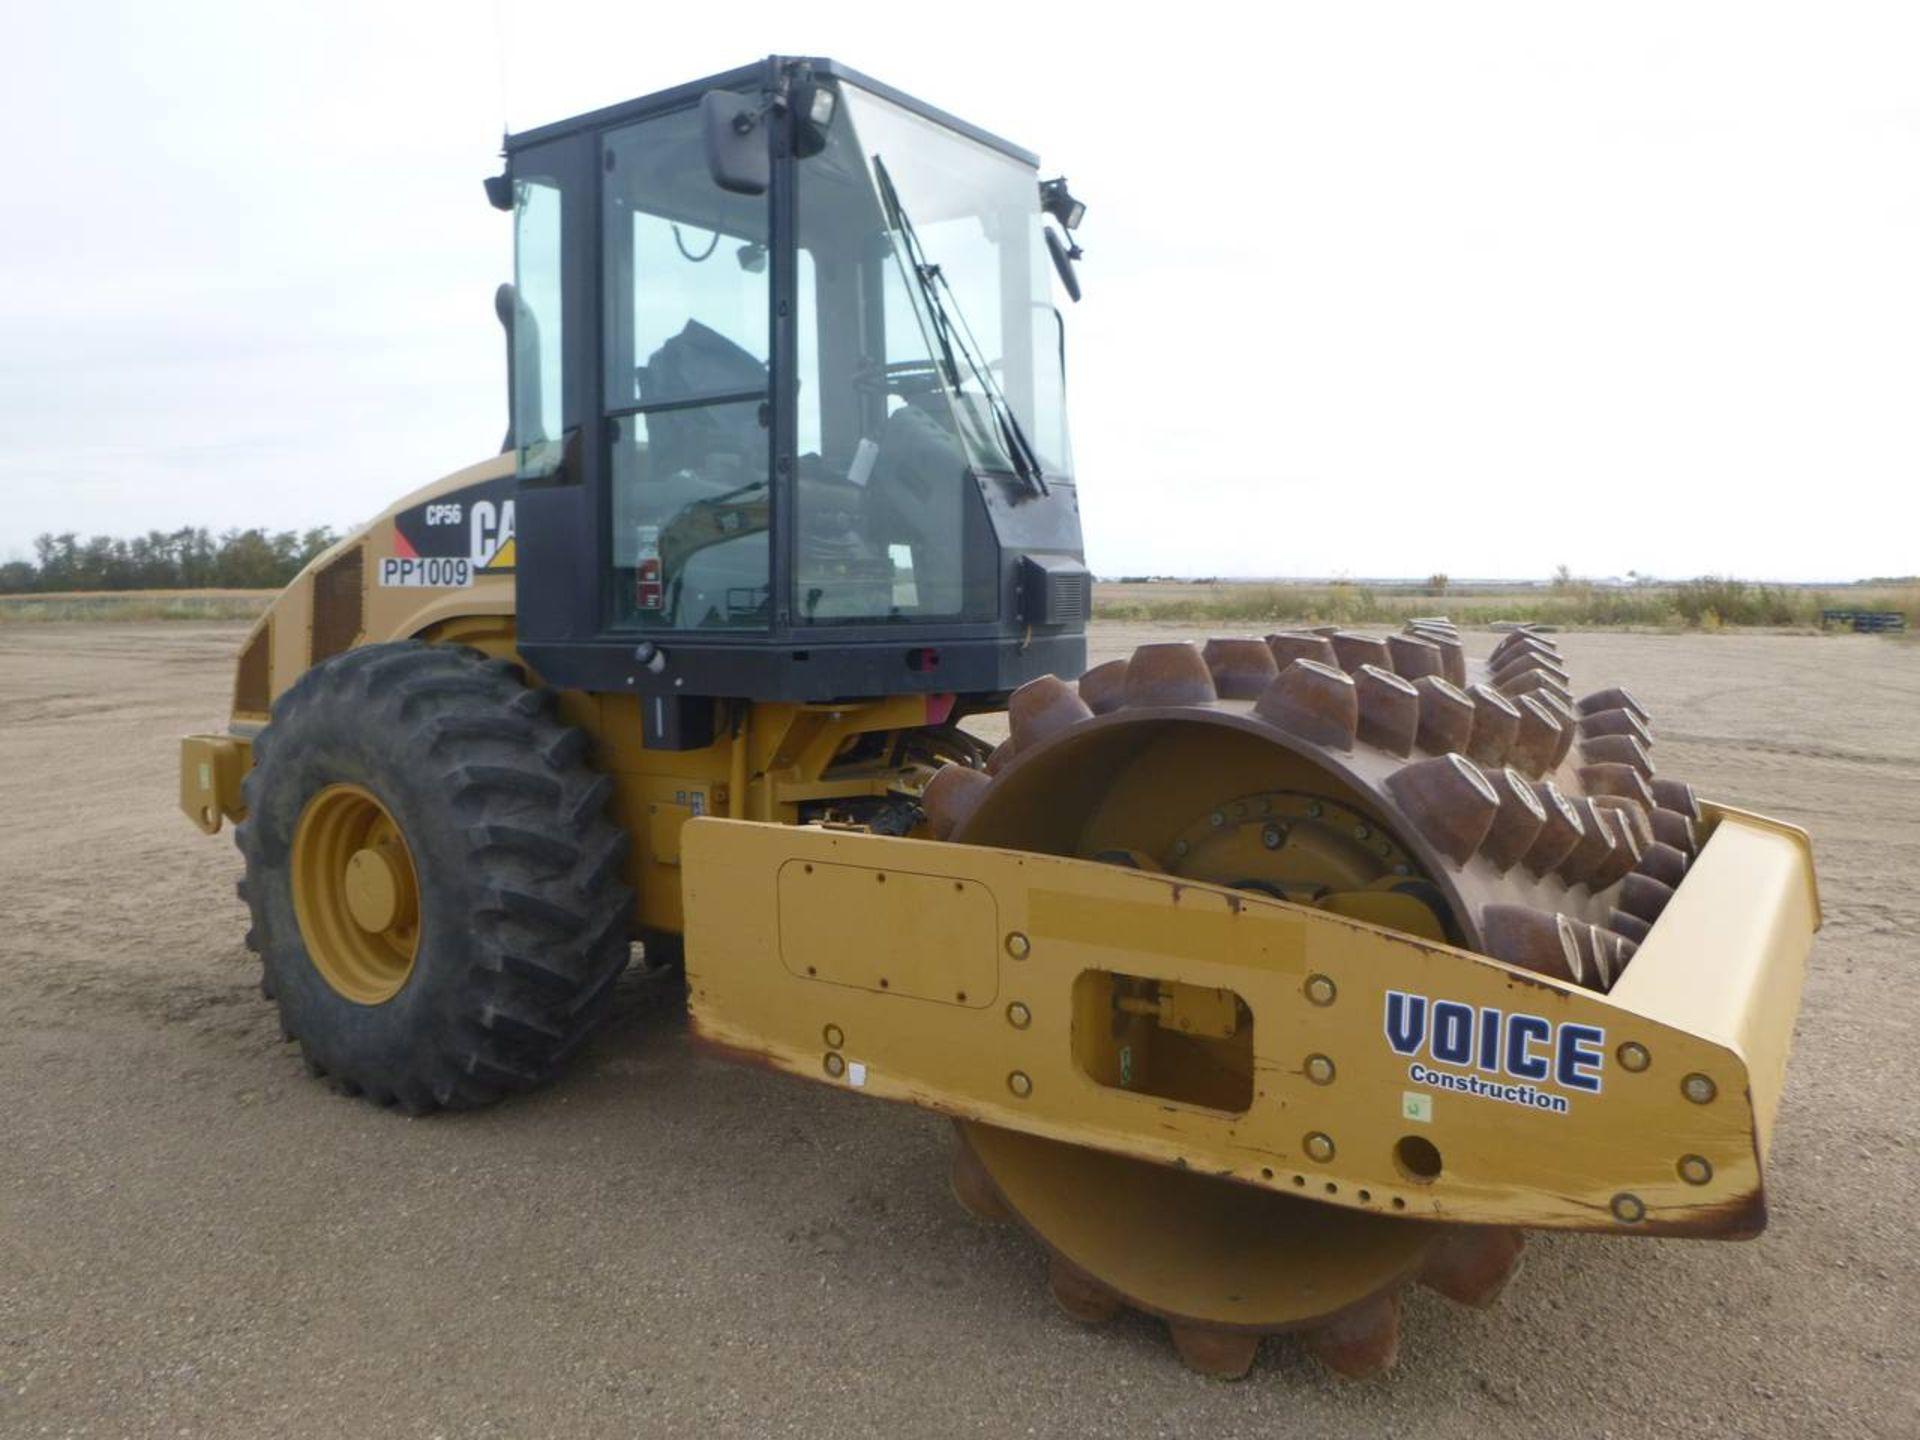 2009 Caterpillar CP56 Compactor - Image 2 of 9